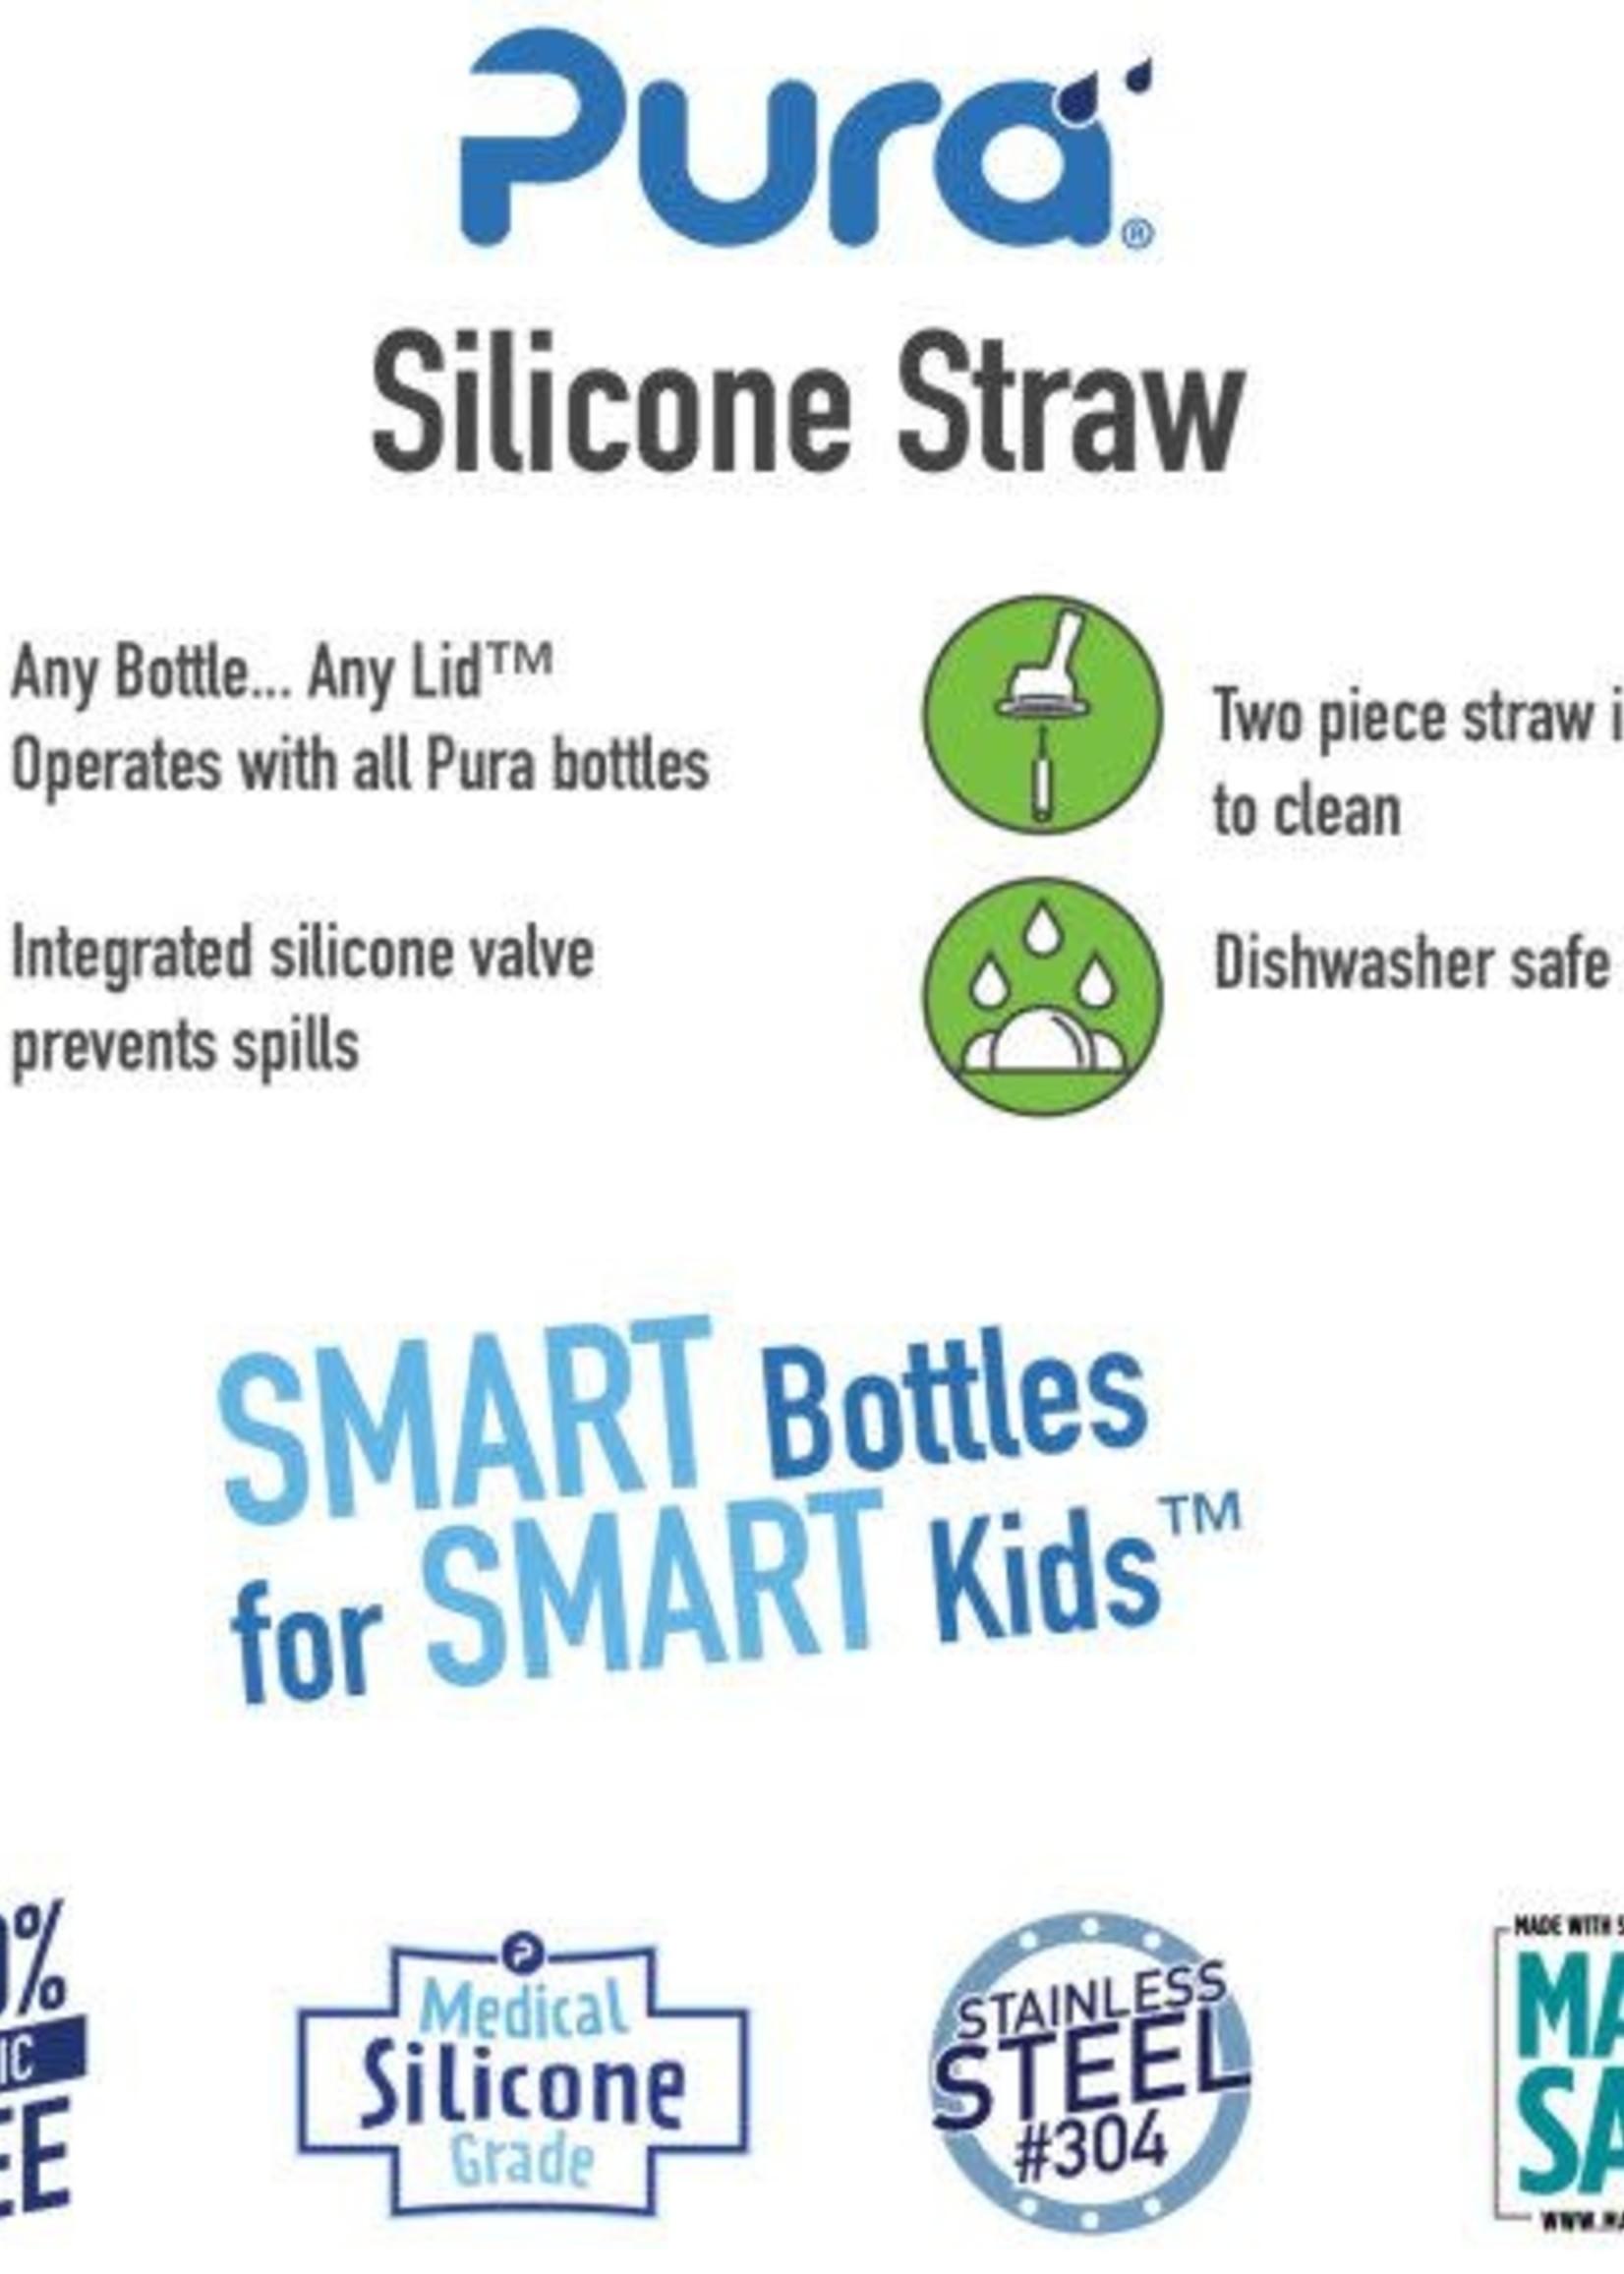 pura kiki pura Silicone Straw